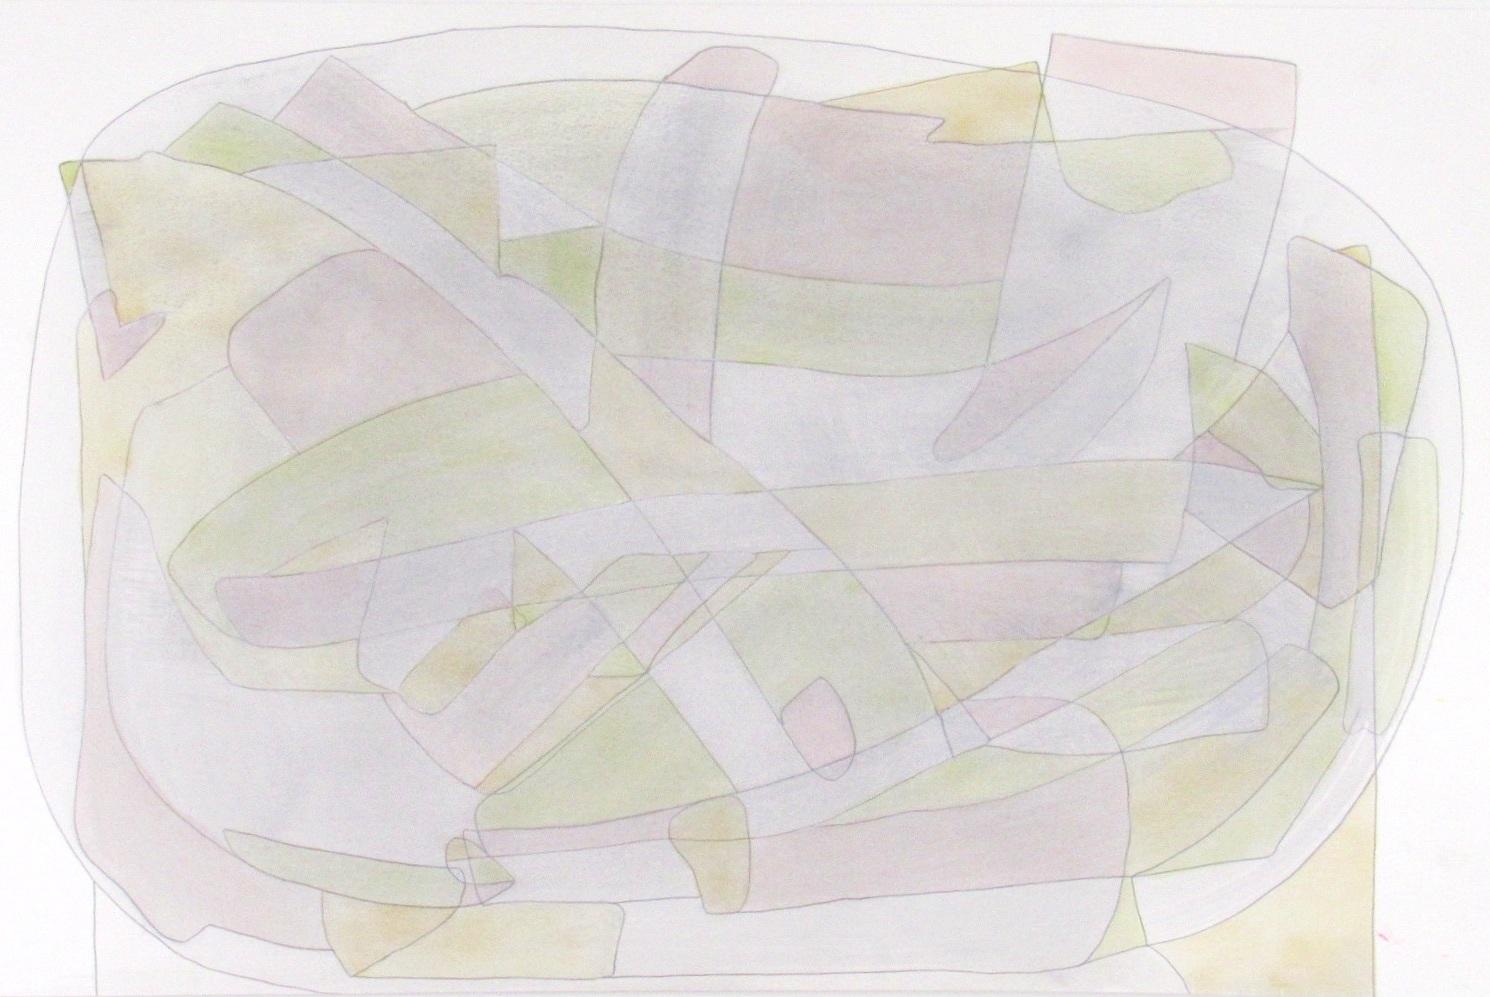 Pleasure 1 - 12x18 mixed media on paper